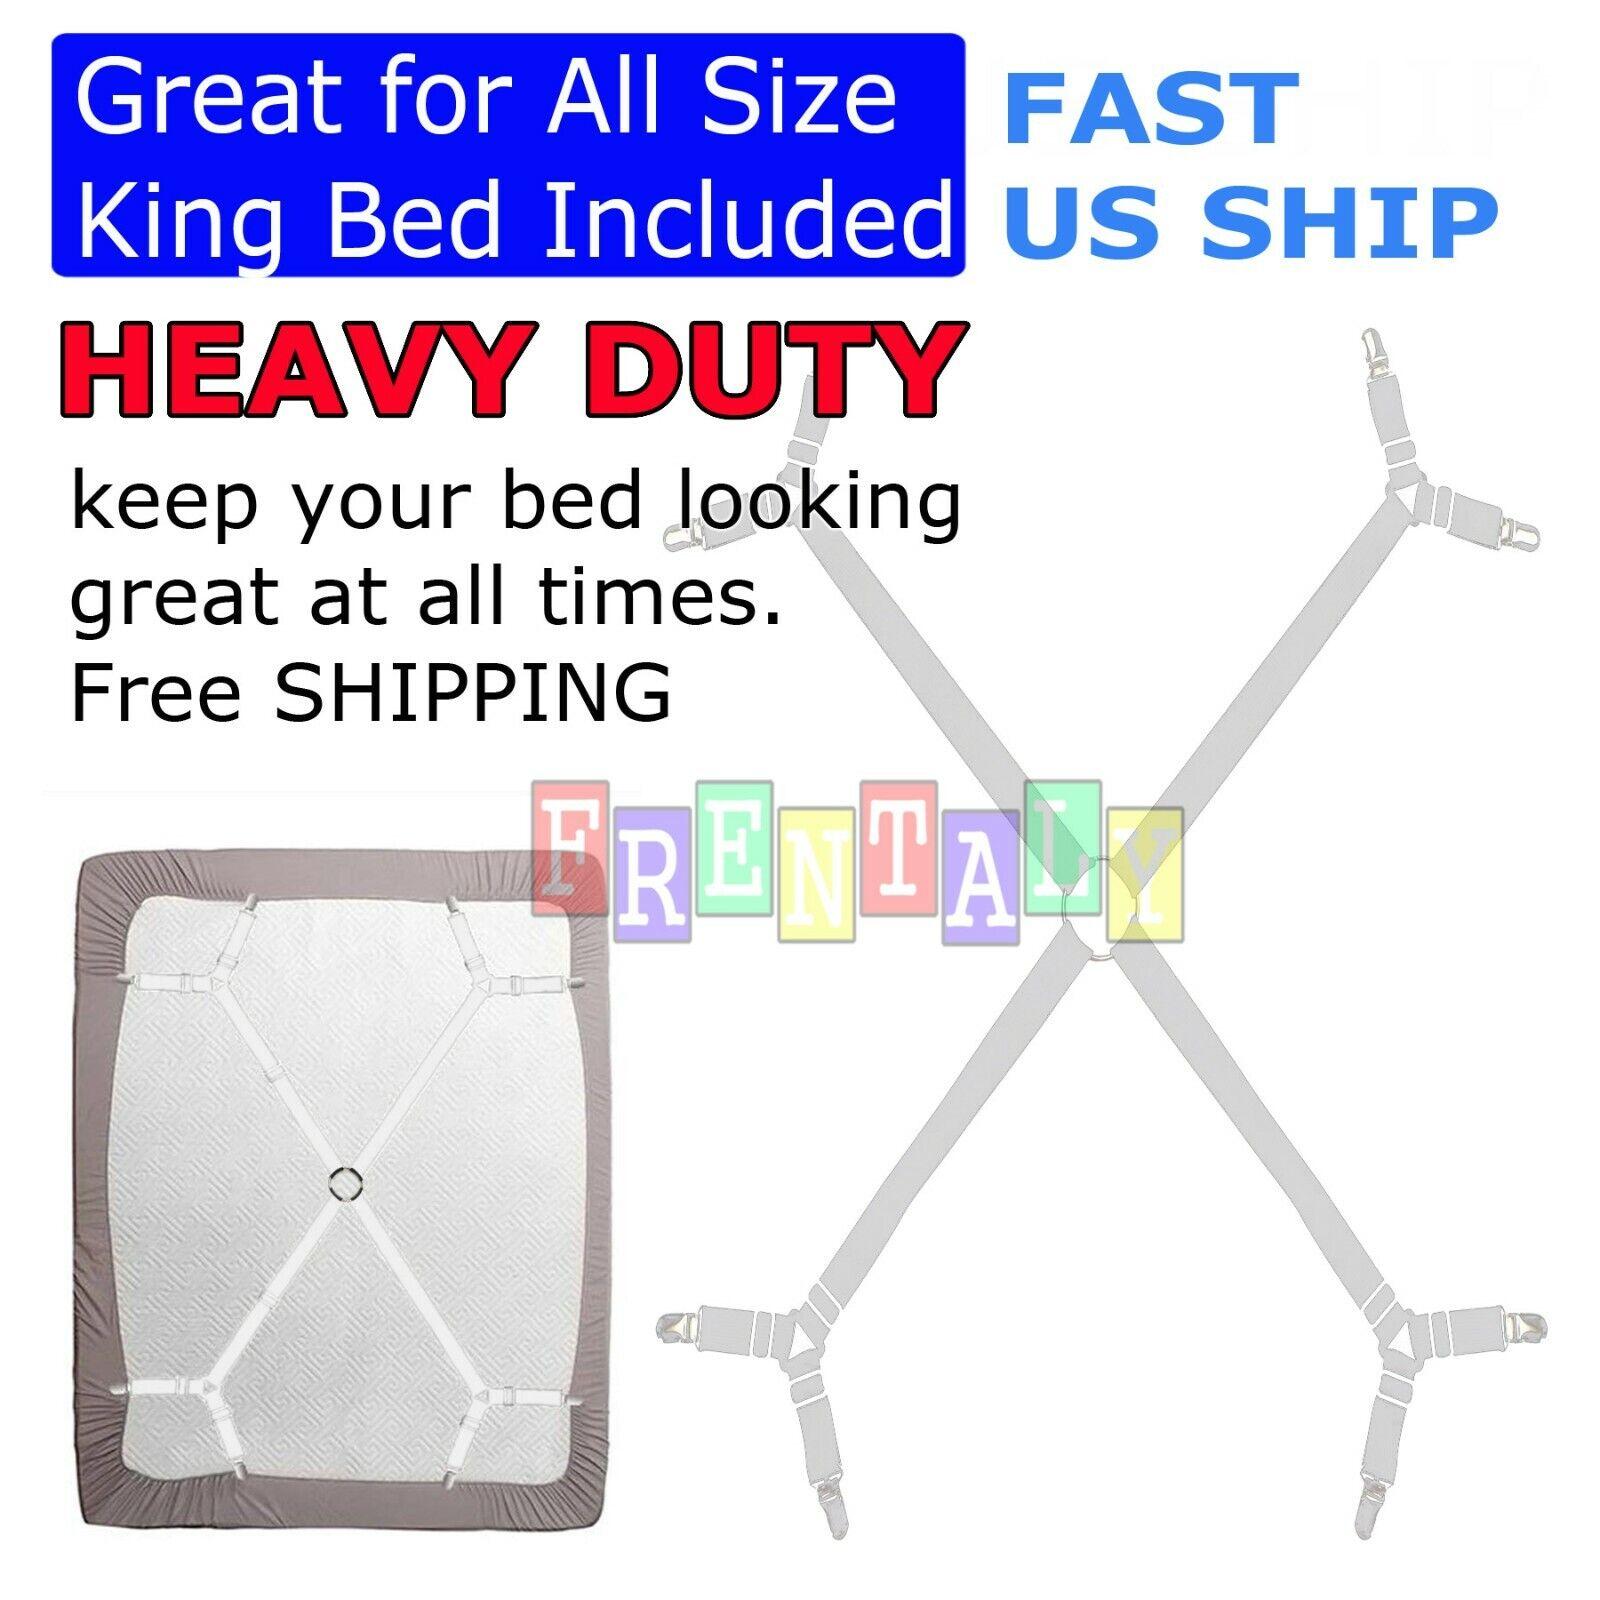 Adjustable Crisscross Bed Fitted Sheet Straps Suspenders Gripper Holder Fastener